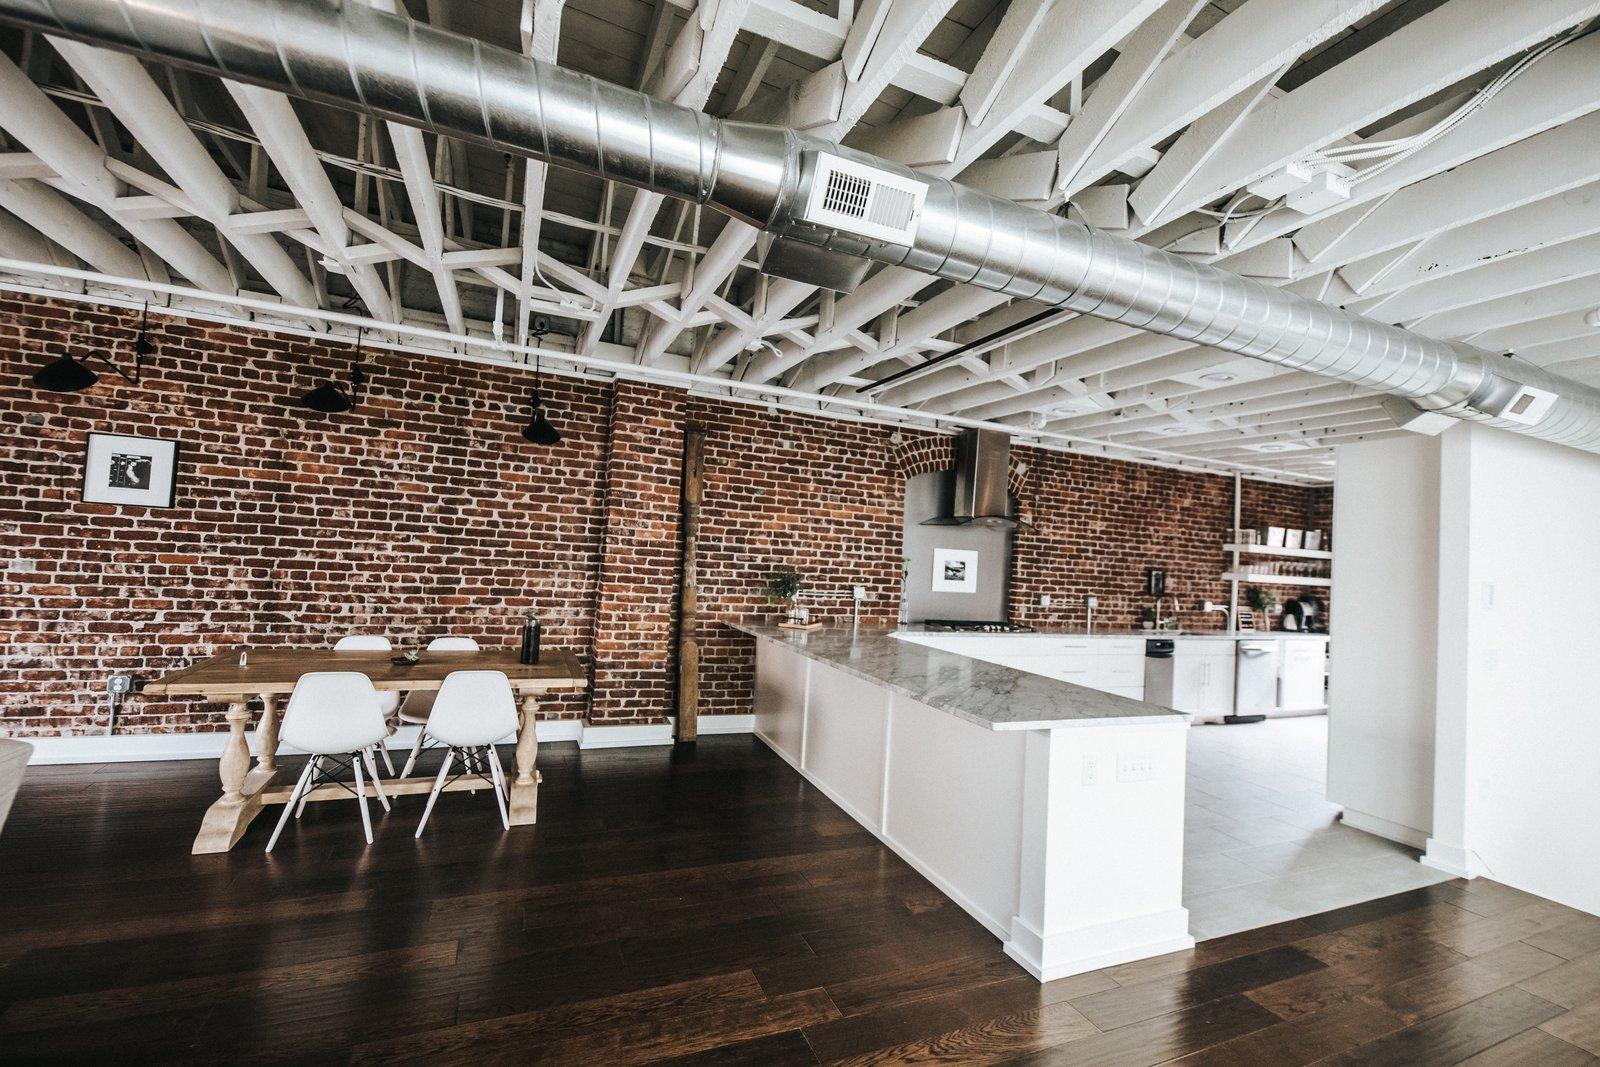 Kitchen, Dark Hardwood Floor, Terrazzo Floor, Dishwasher, White Cabinet, Cooktops, Range Hood, Brick Backsplashe, Marble Counter, and Wood Cabinet Kitchen/Dining View  Frindle